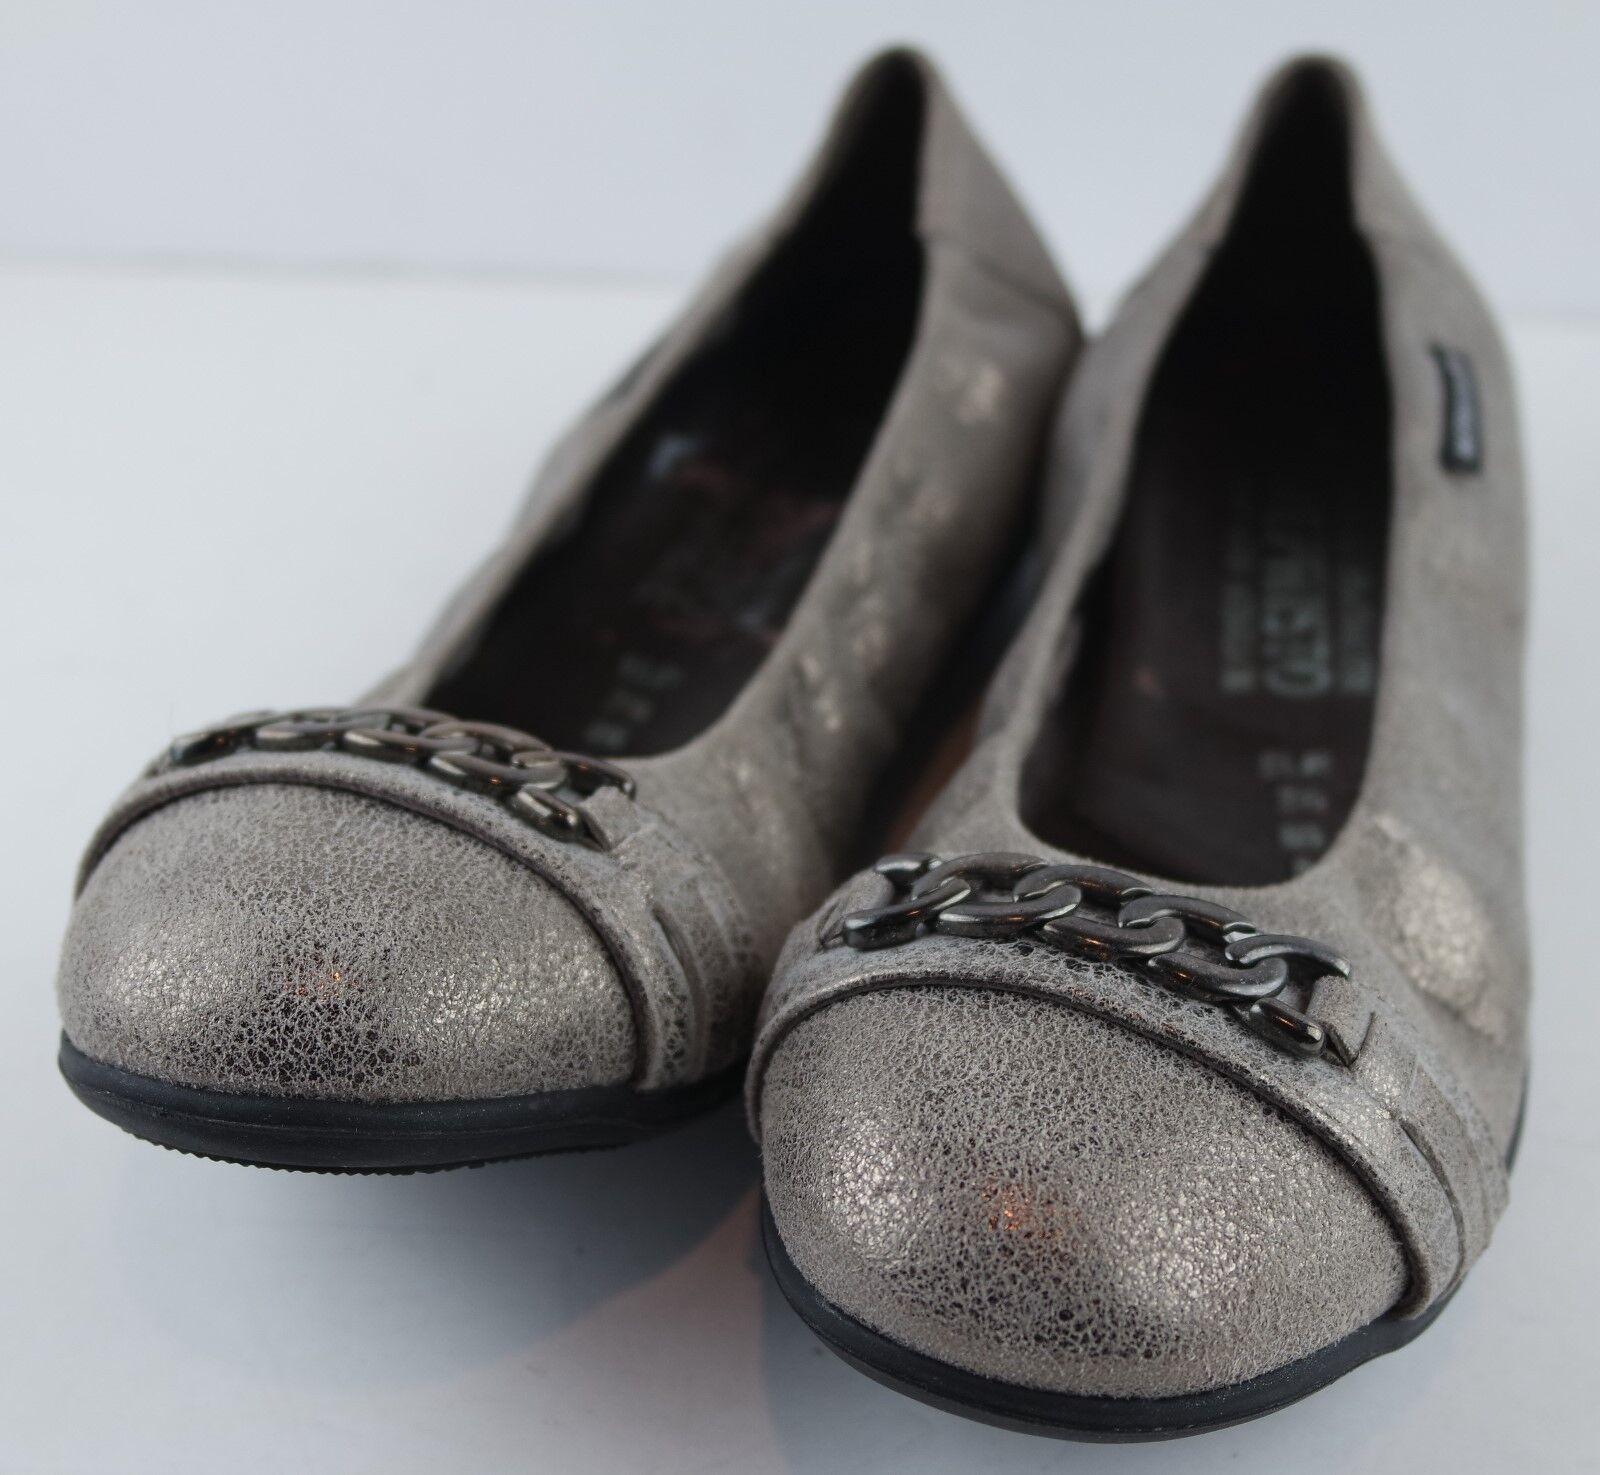 Mephisto Women's Bronze Taupe Leather Ballet Flats Metallic Chain Detail Size 5